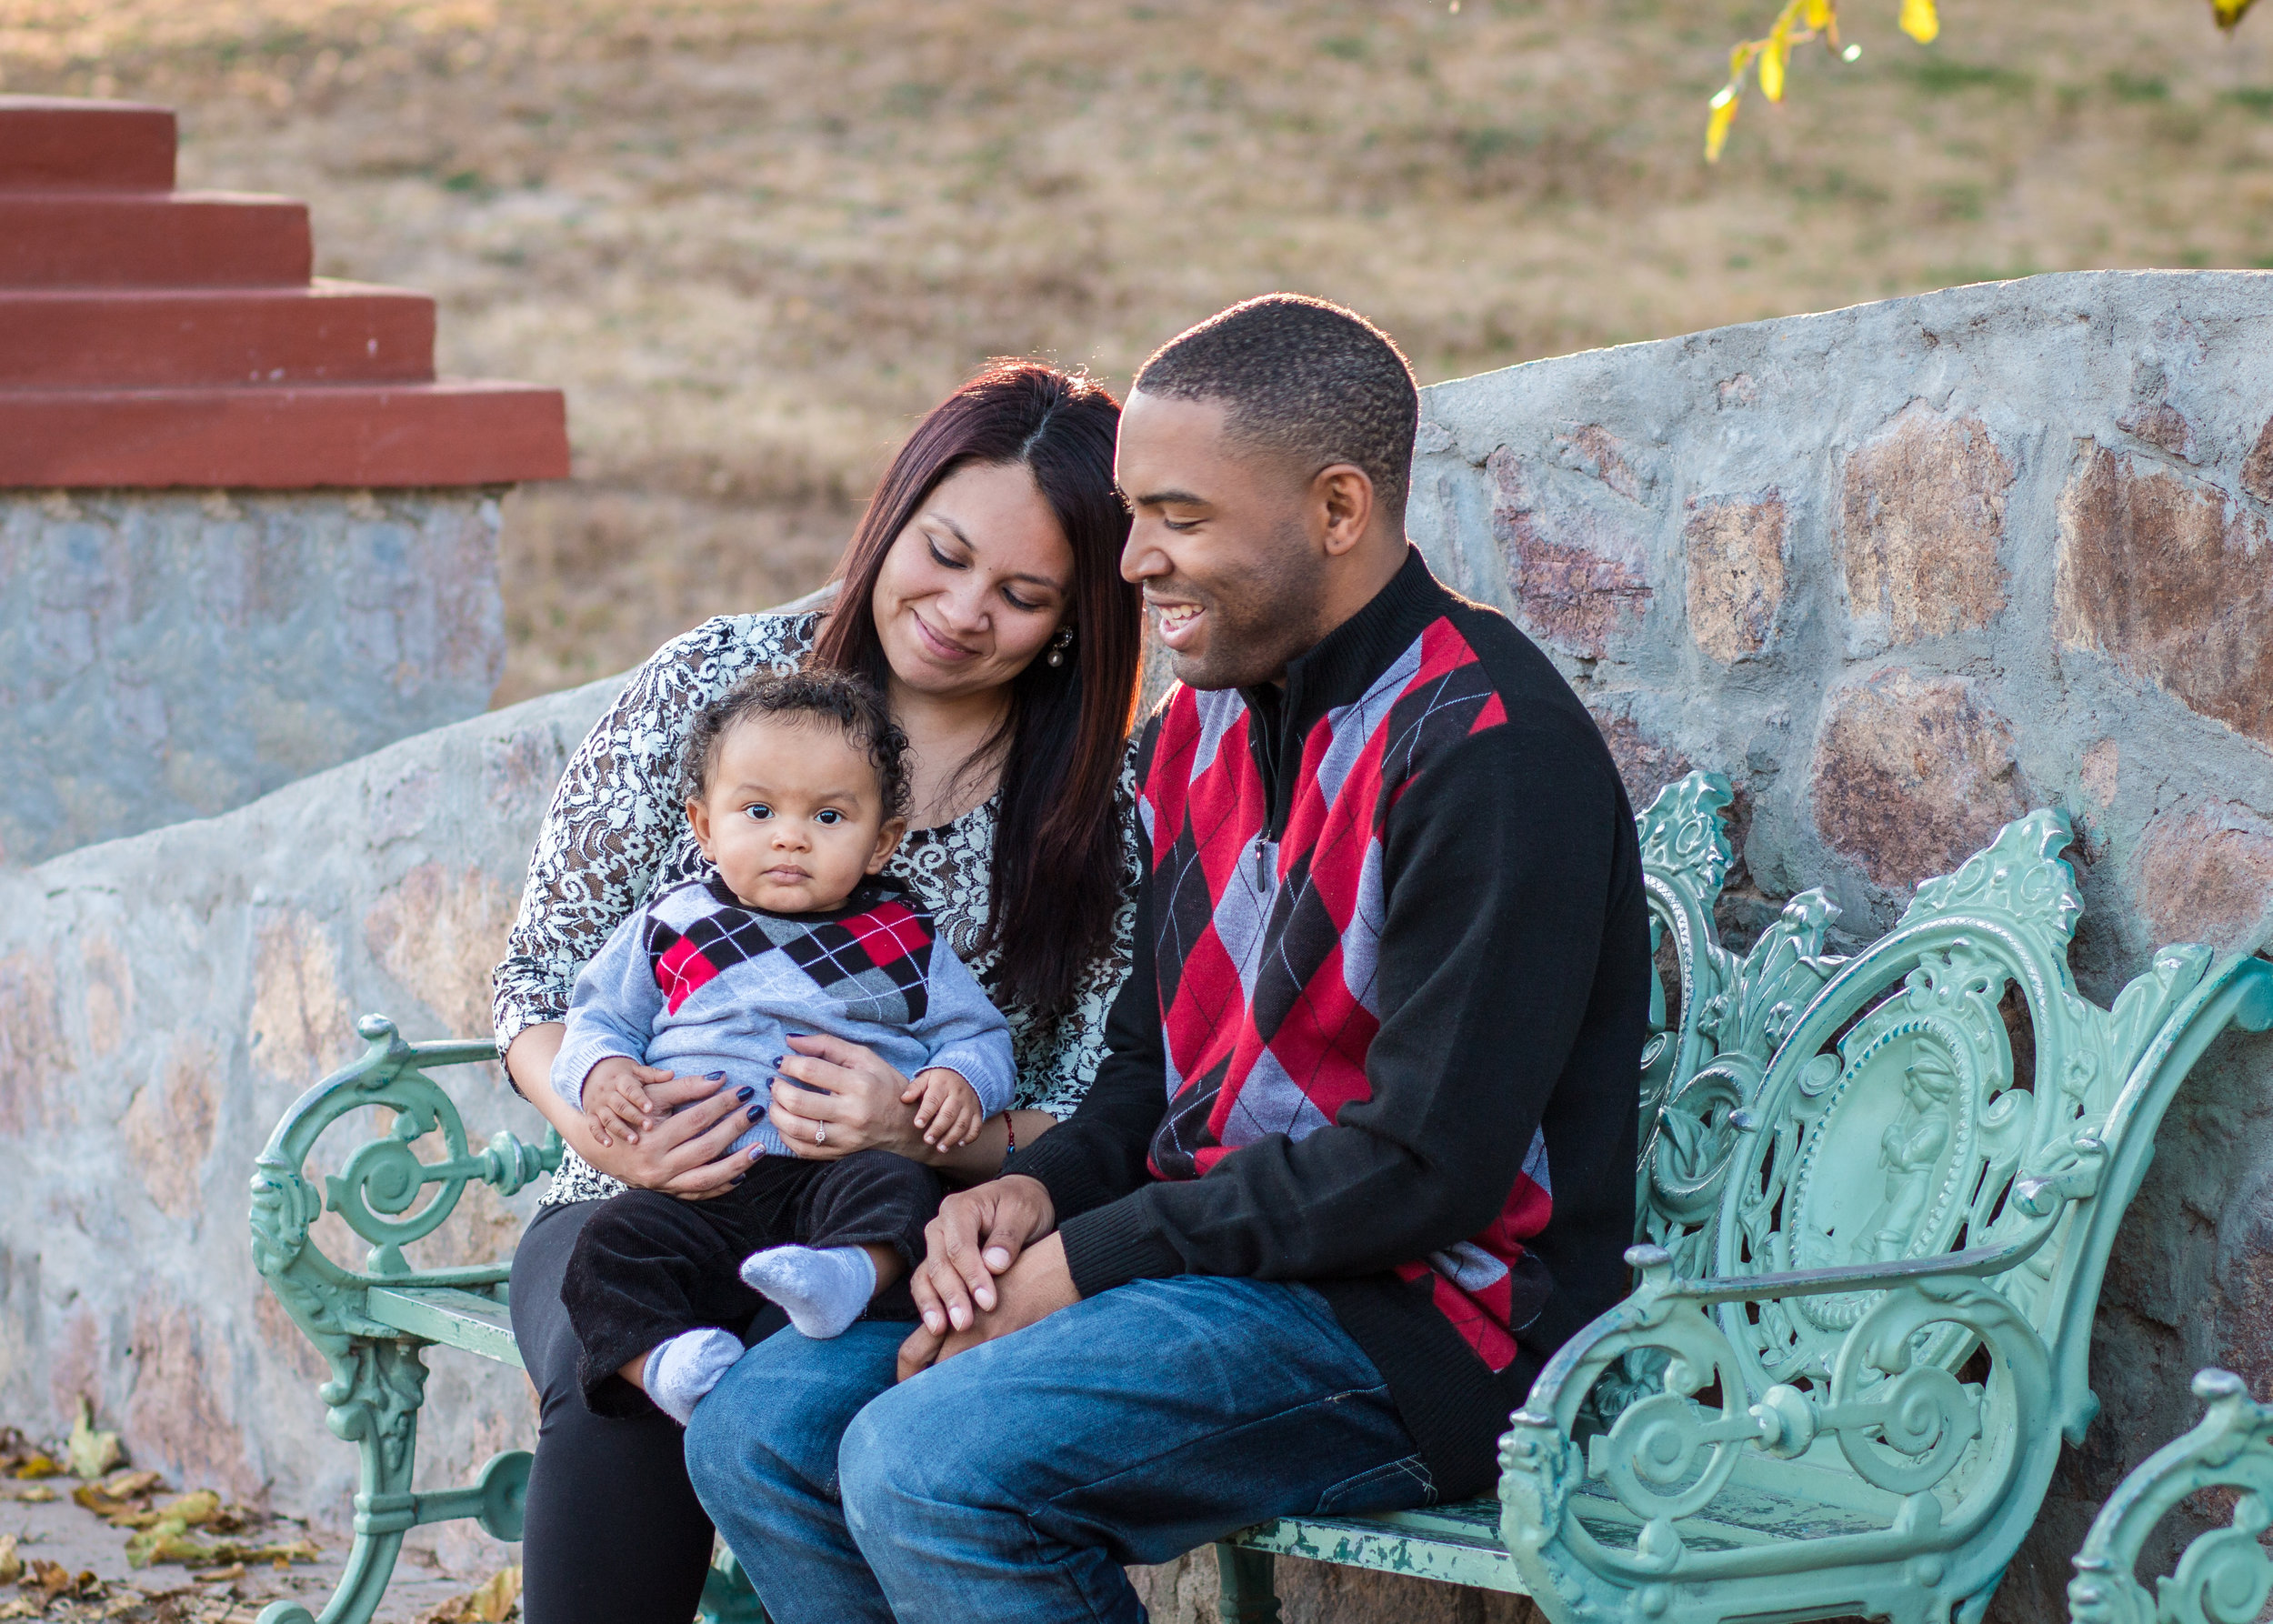 El Paso Family Portrait